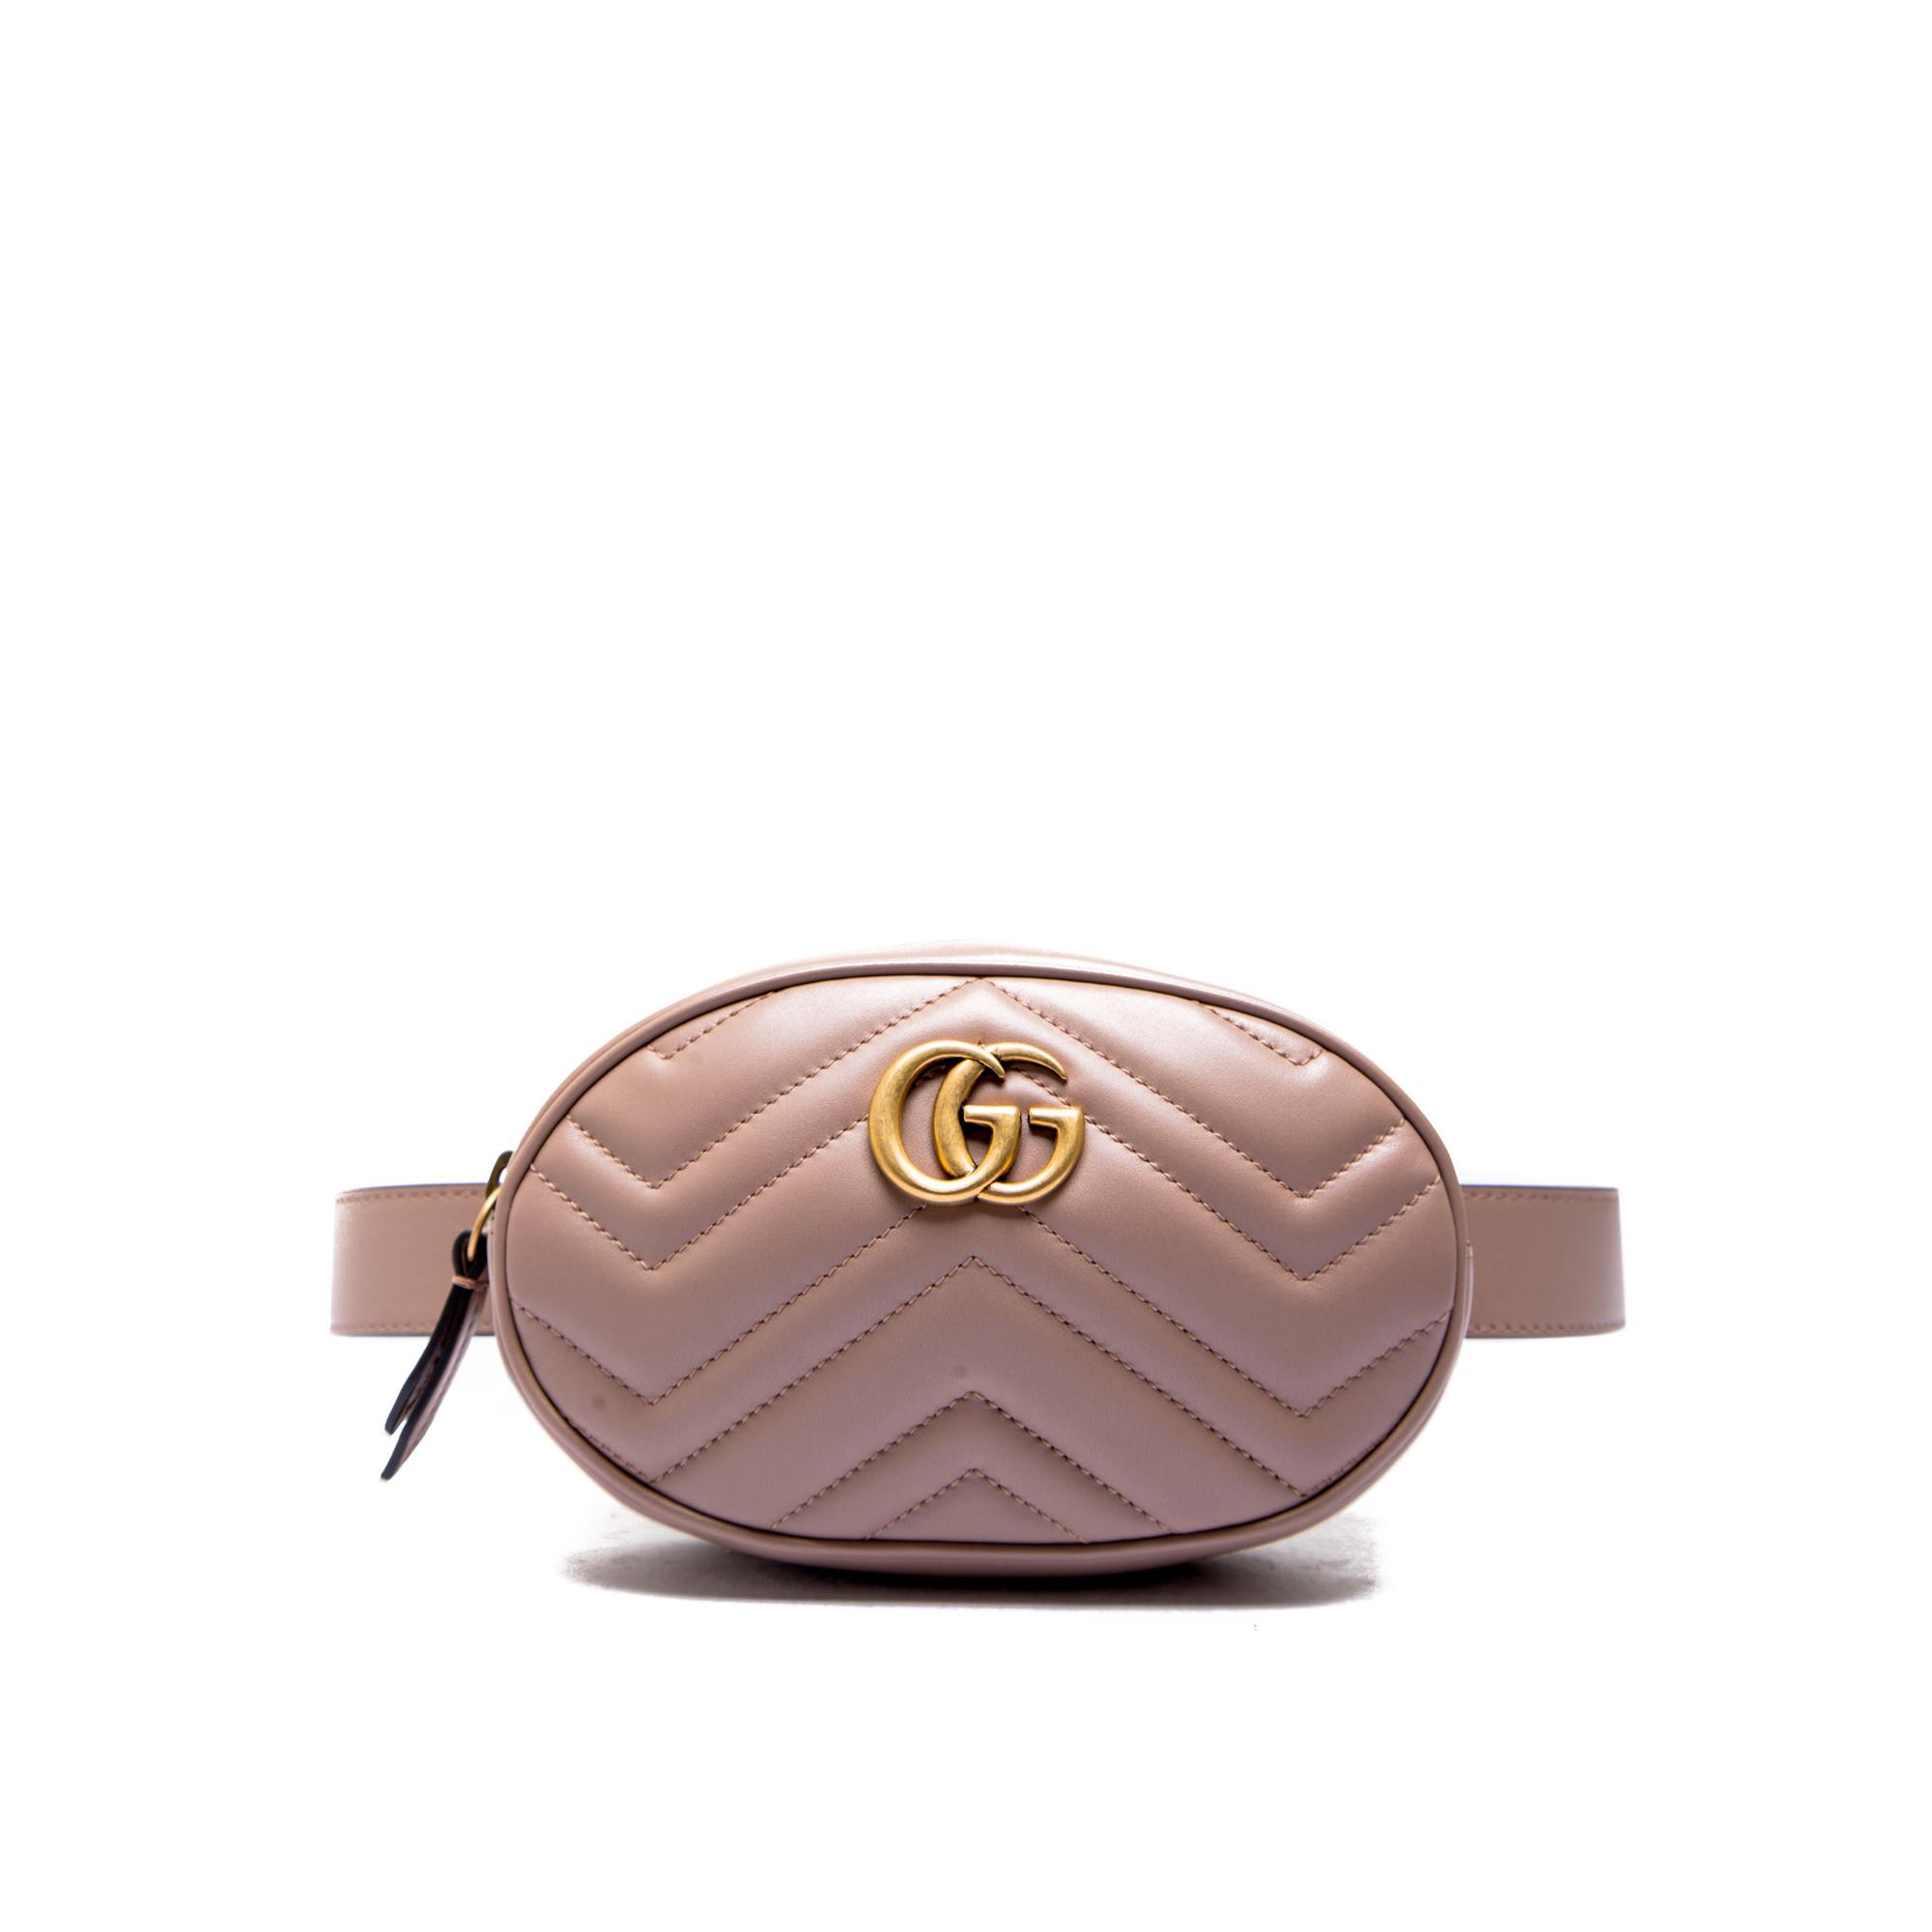 012caa58f4be83 Gucci belt bag with remov belt pink476434 / dsvrt / 5729 ss19